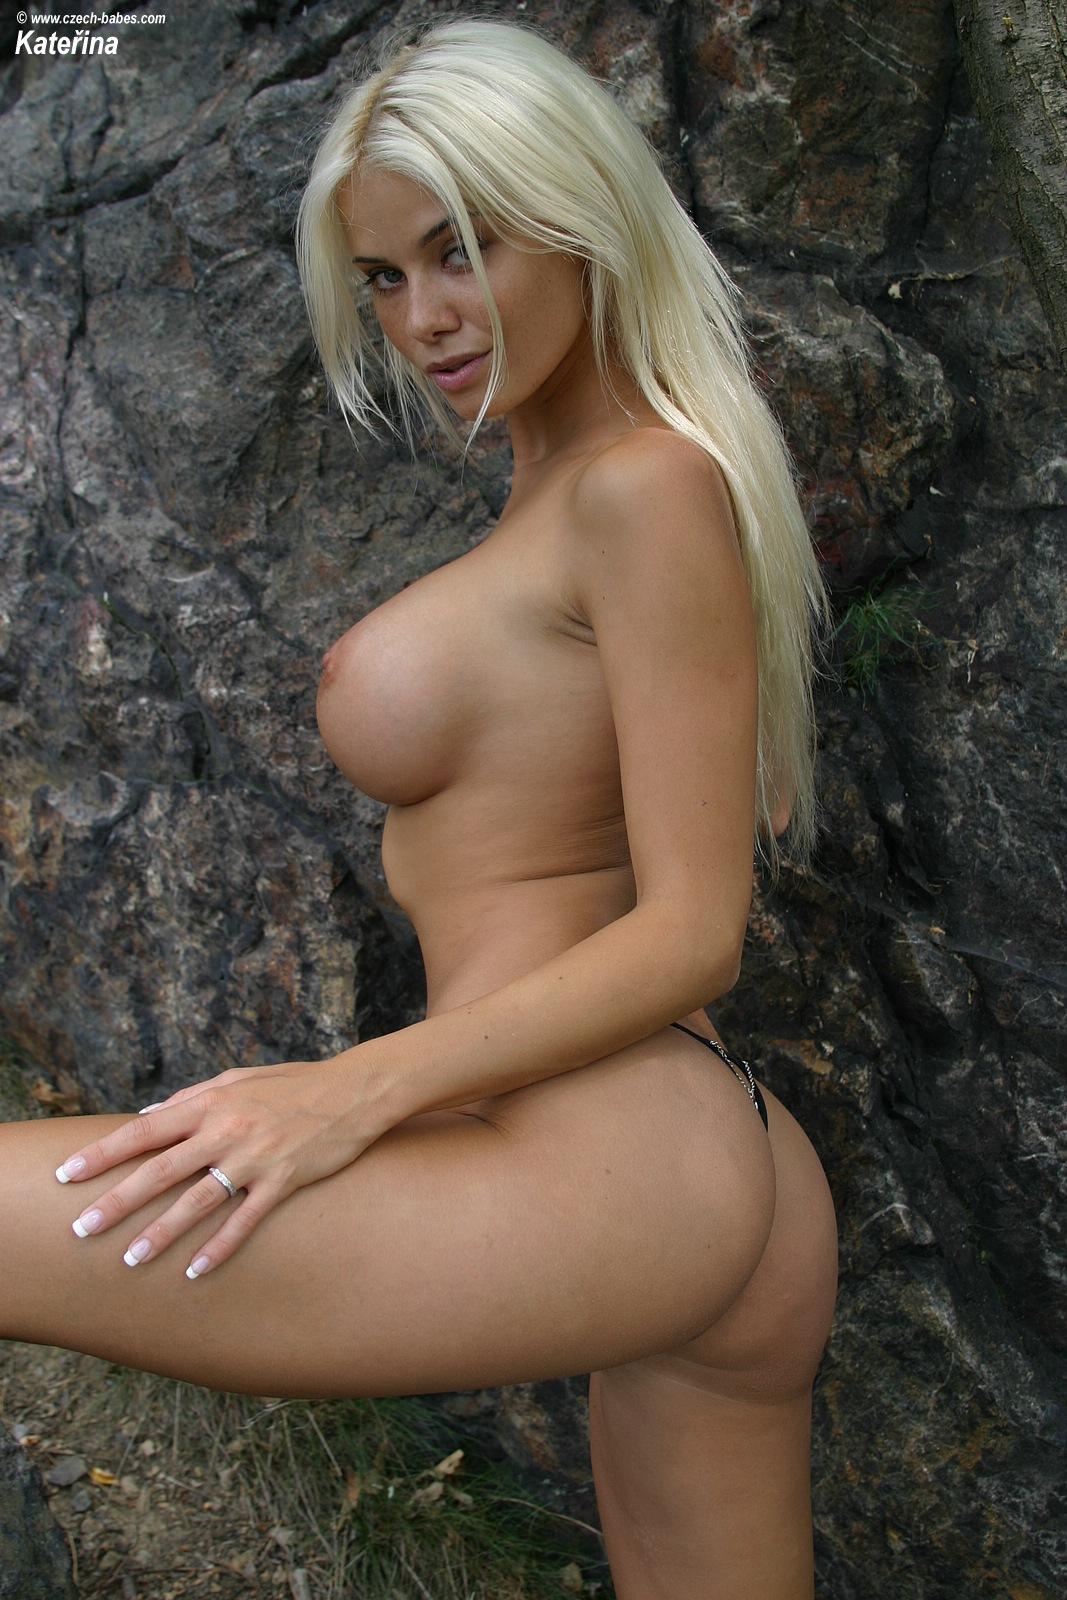 katerina-blonde-boobs-flip-flops-outdoor-naked-12